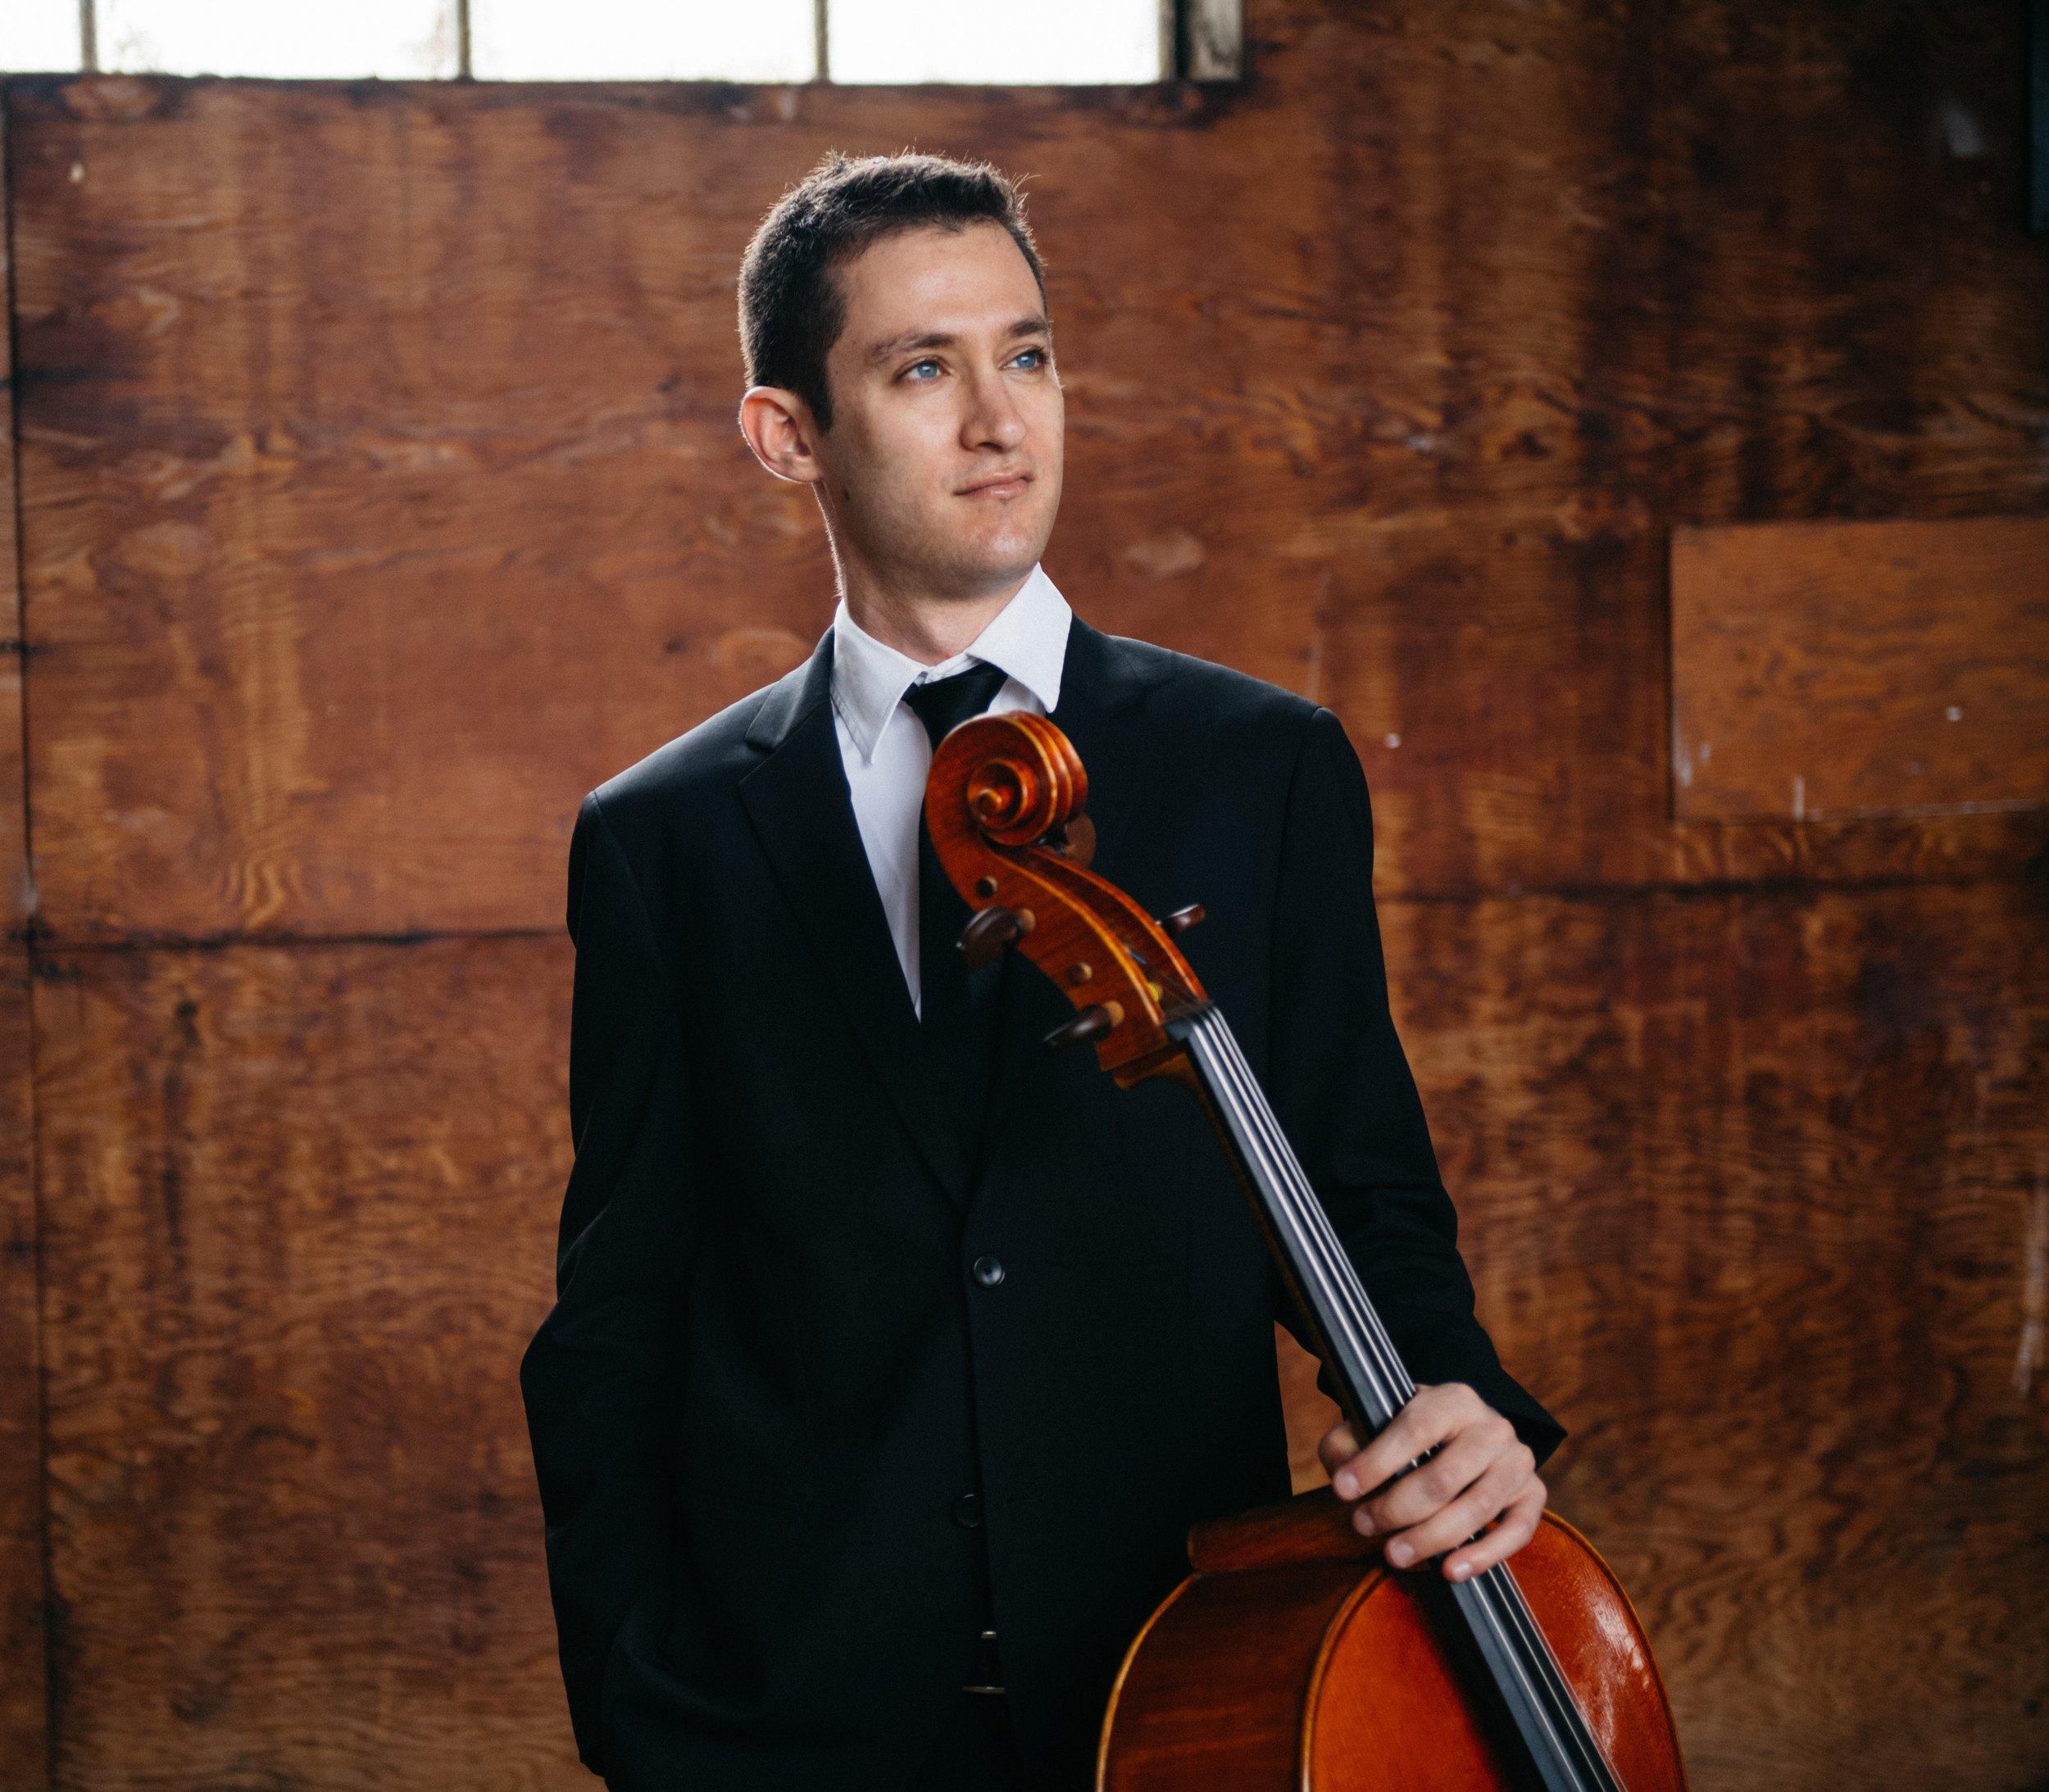 Michael Katz cello_headshot cropped.jpg